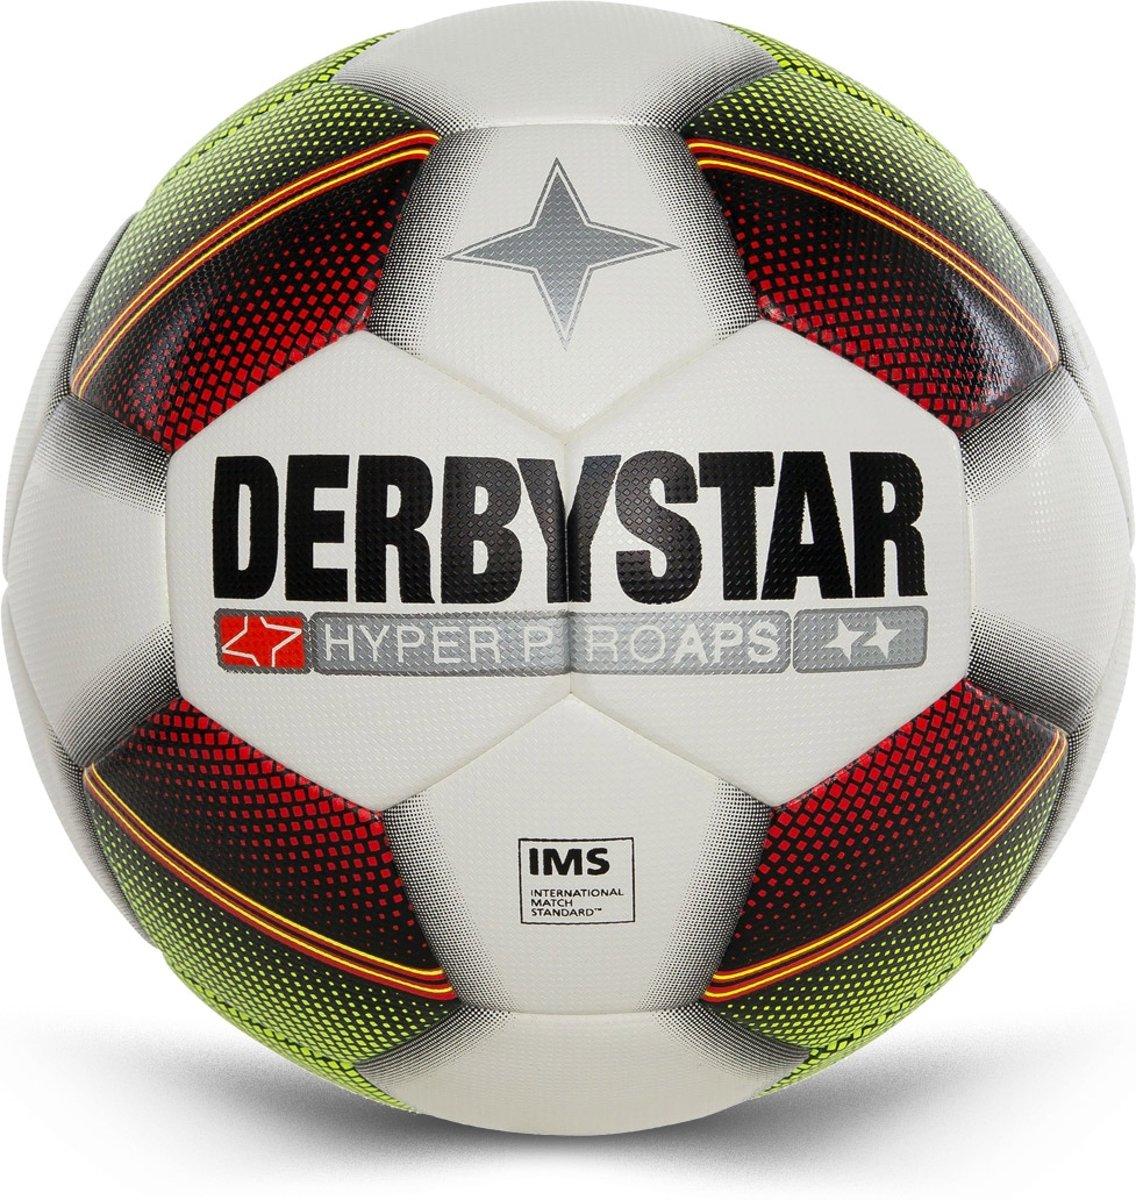 Derbystar VoetbalVolwassenen - wit/rood/groen